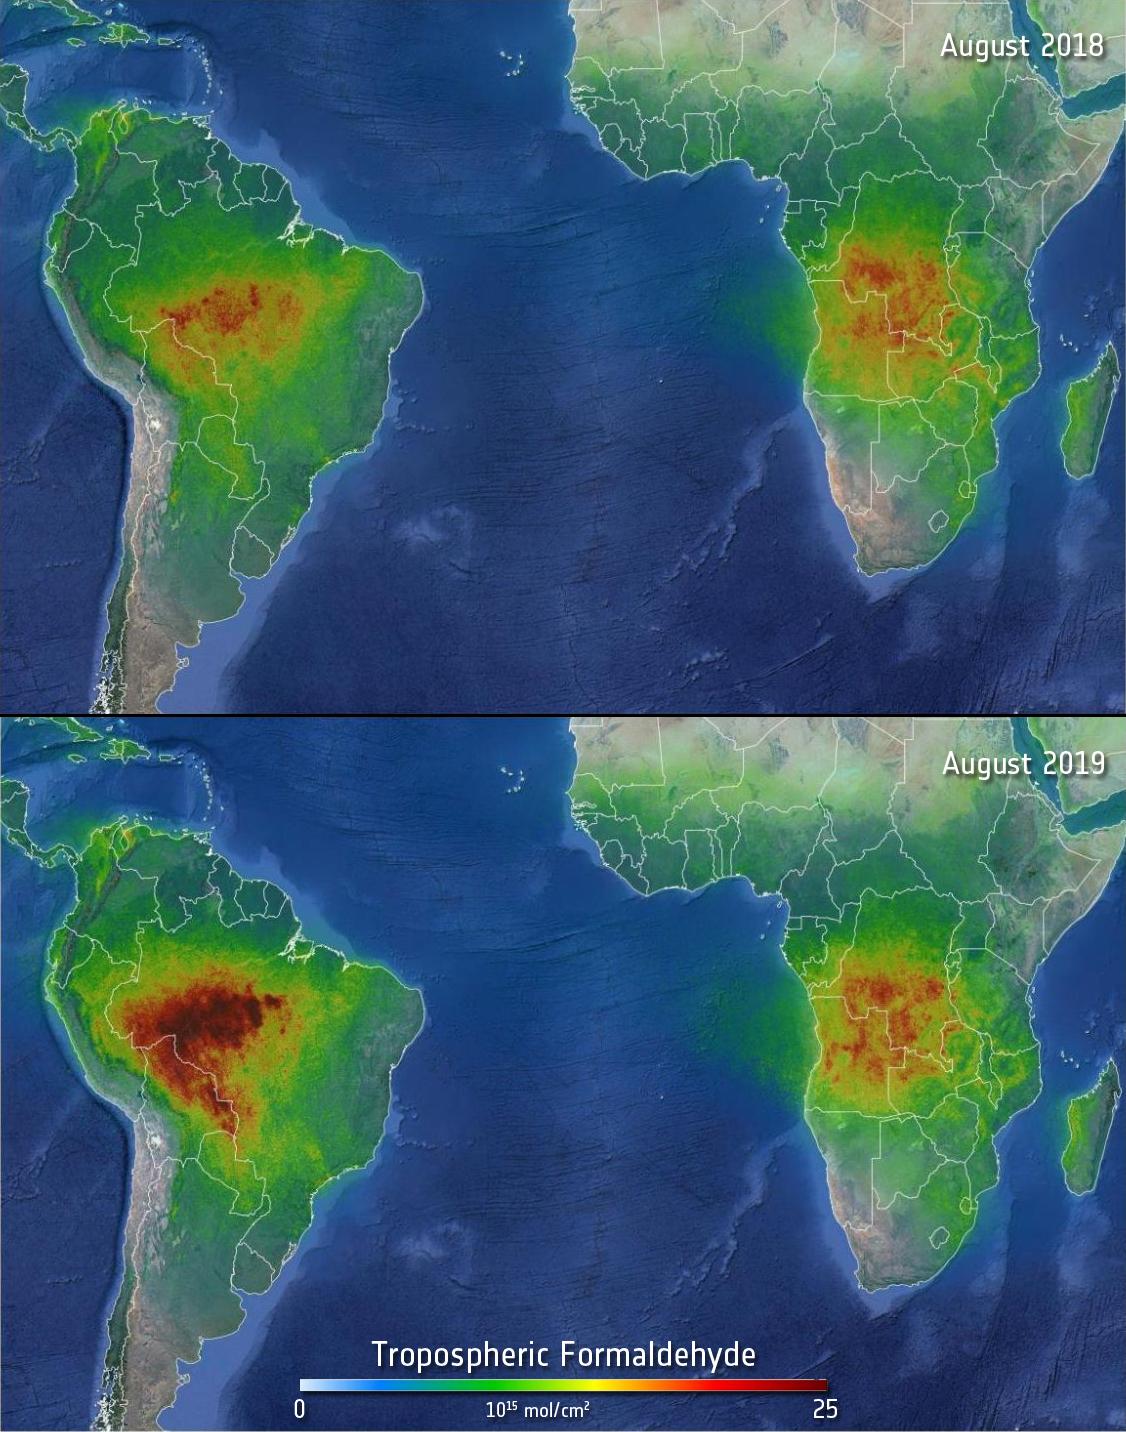 https://cff2.earth.com/uploads/2019/09/10124659/Formaldehyde.jpg